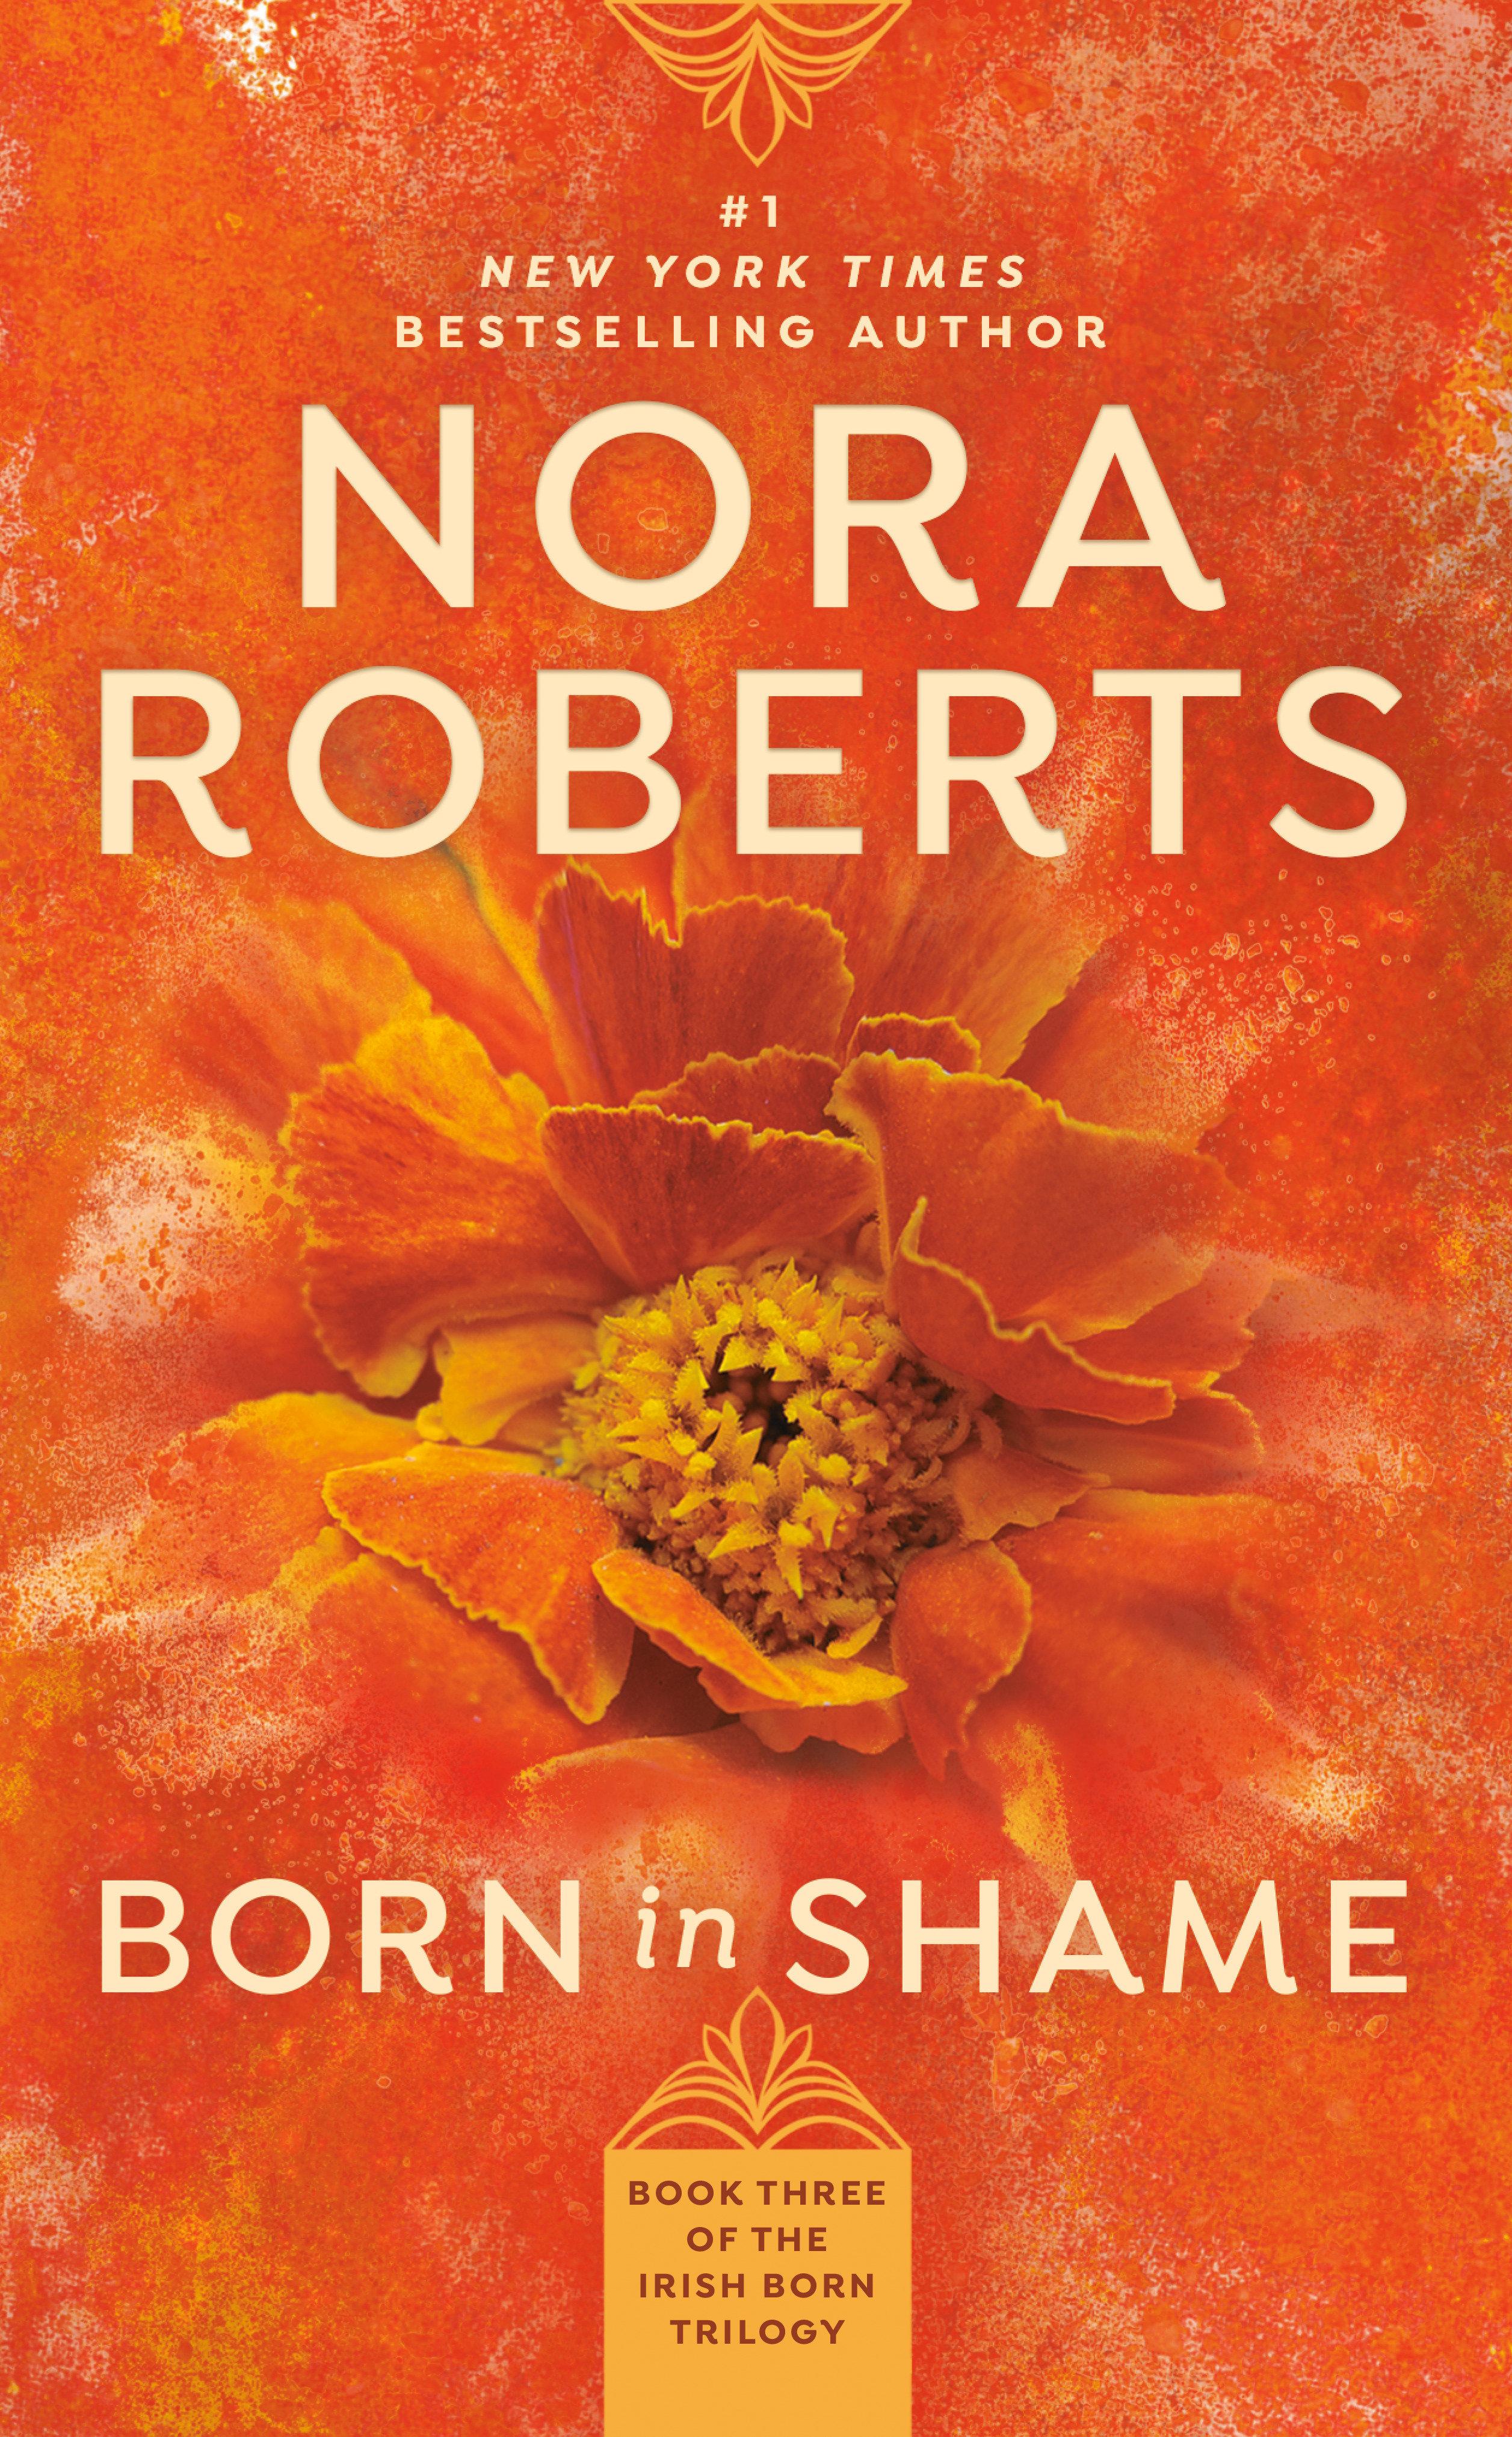 Born in shame cover image